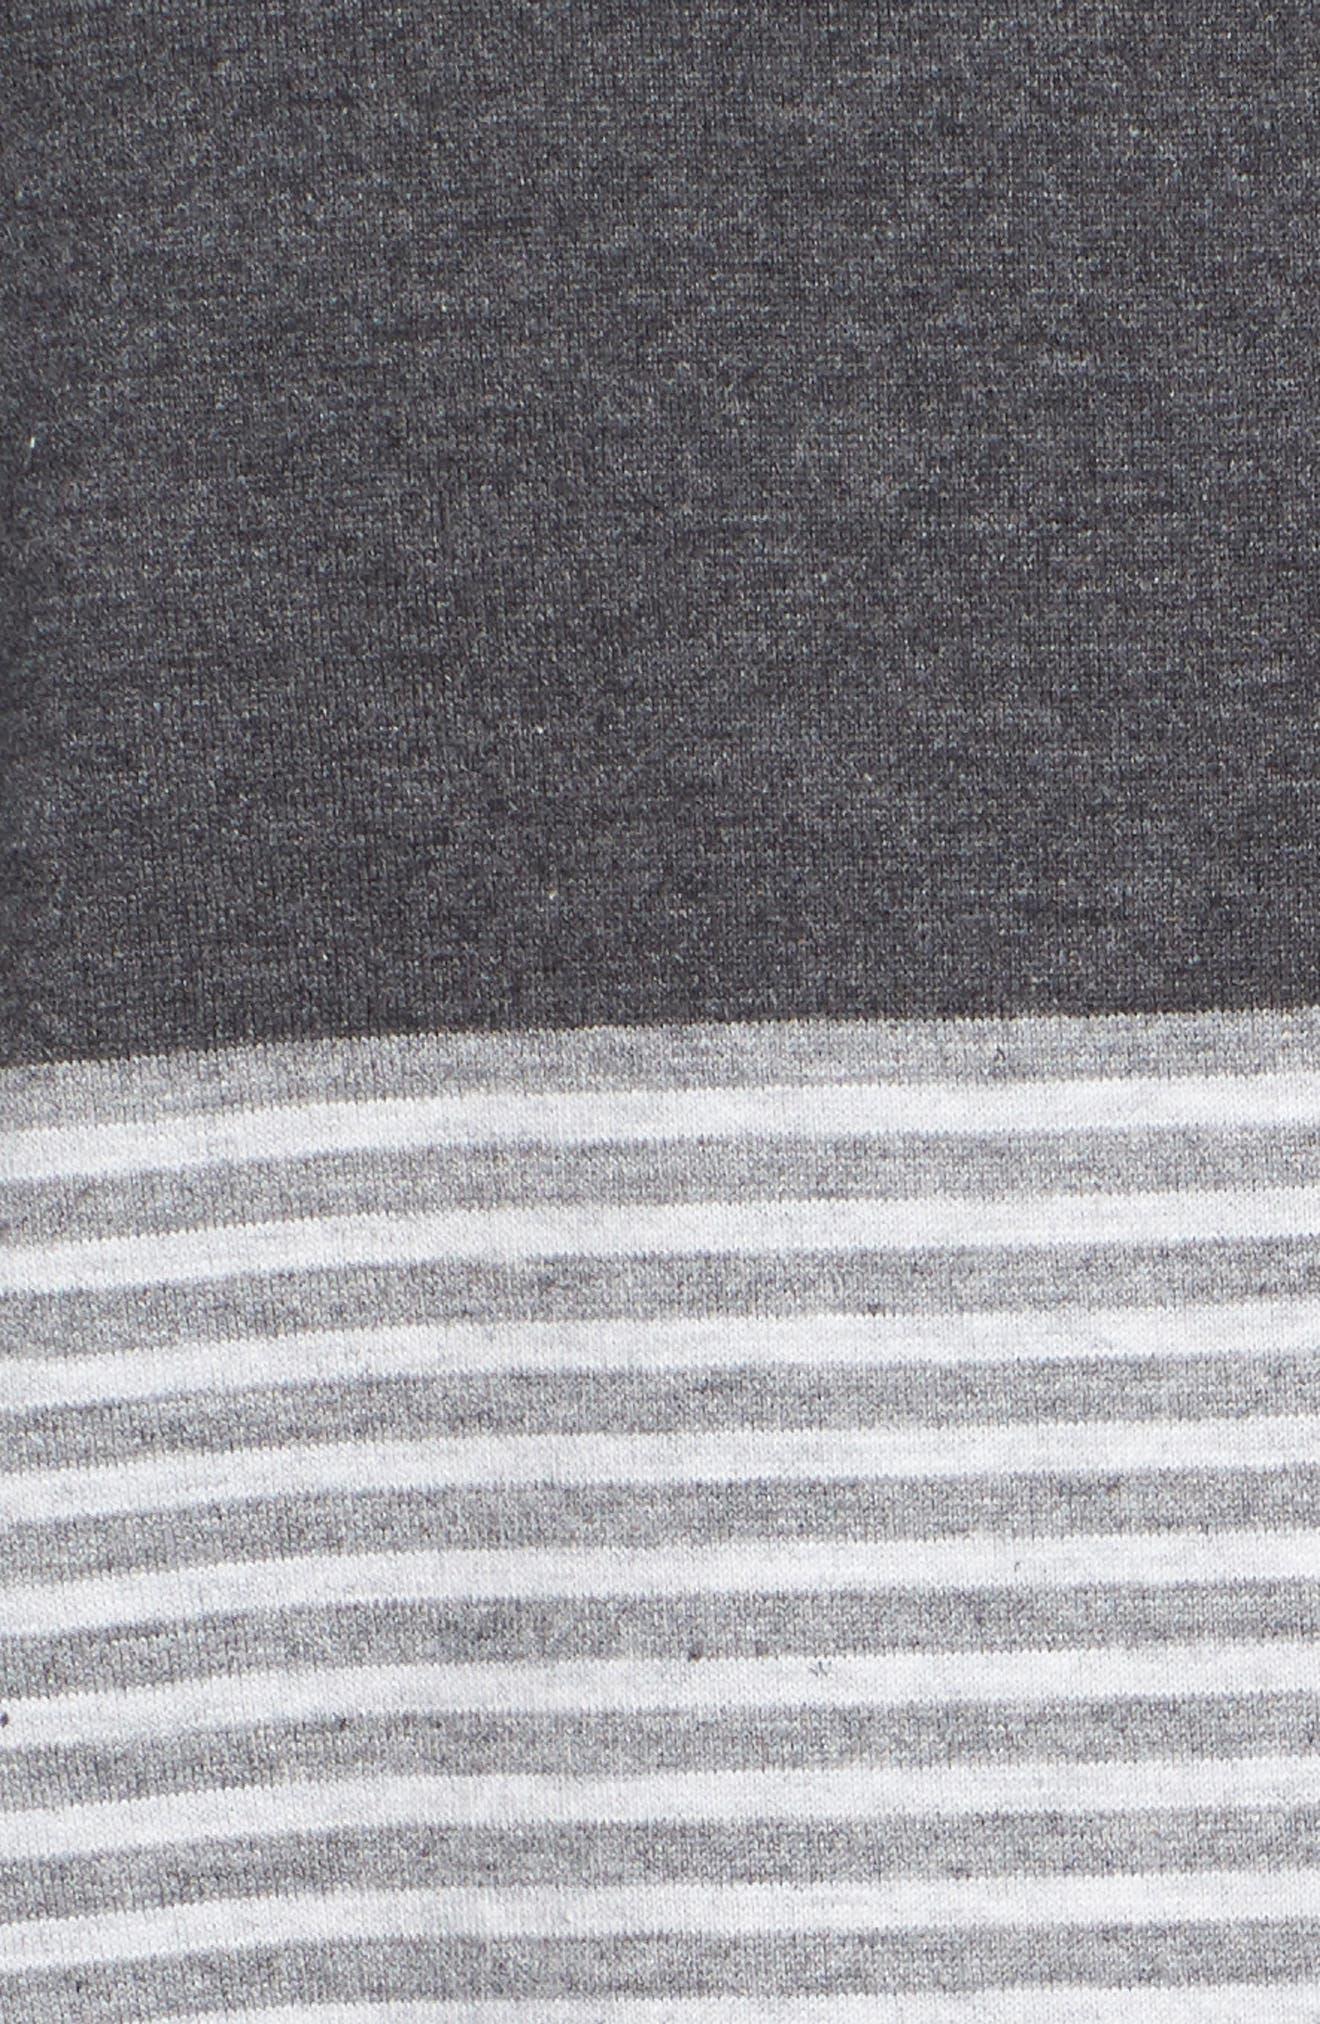 Baisch Regular Fit Polo,                             Alternate thumbnail 5, color,                             HEATHER GREY PINSTRIPE